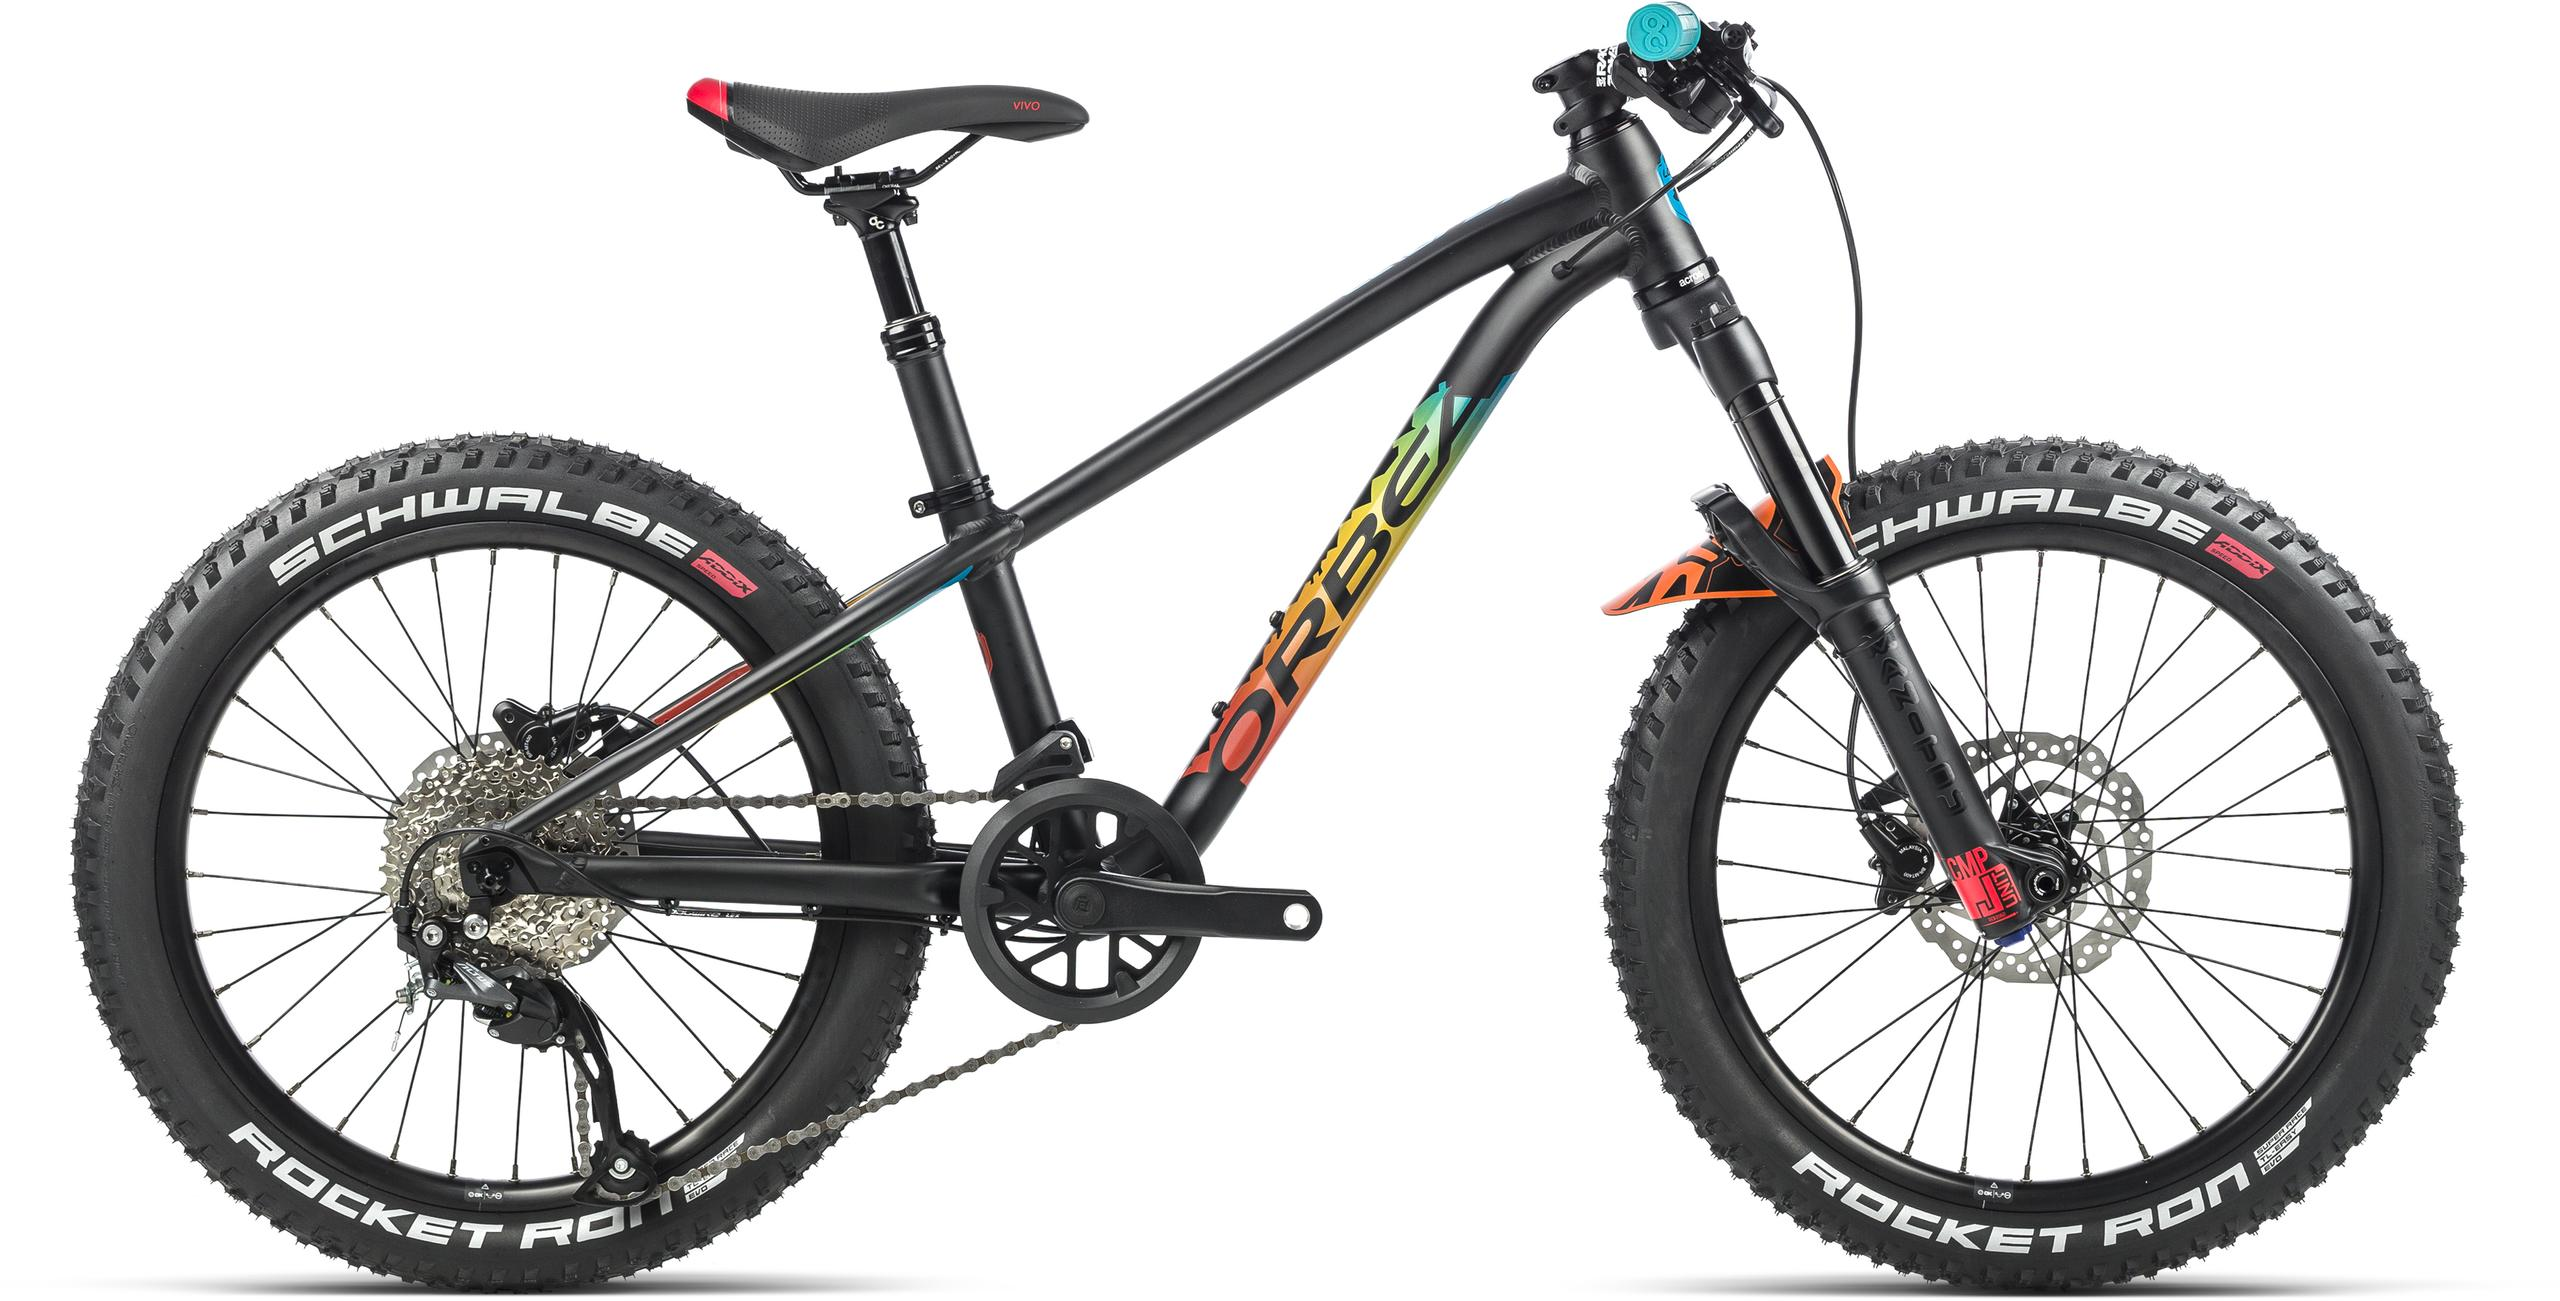 orbea laufey 20 h10 kids bike black-rainbow 2021 - j e